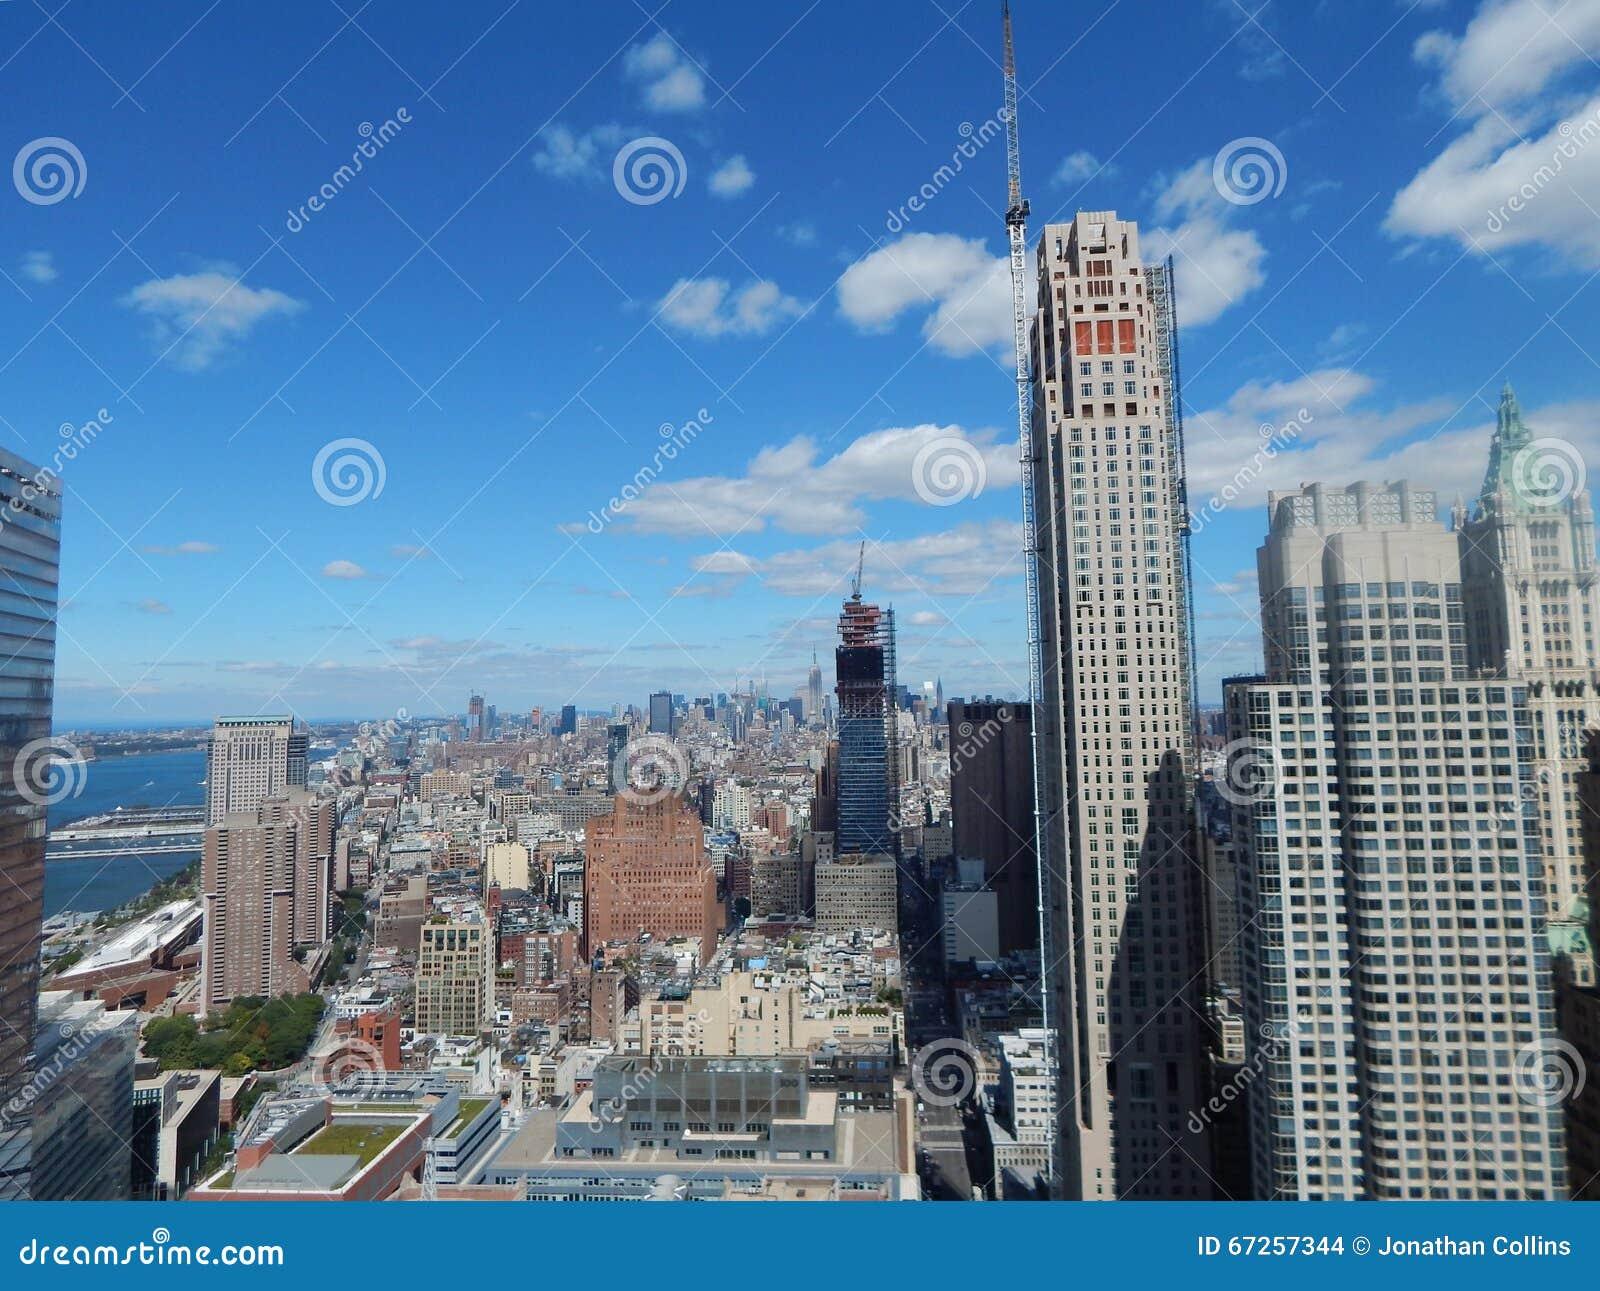 Travel New Jersey To Manhattan